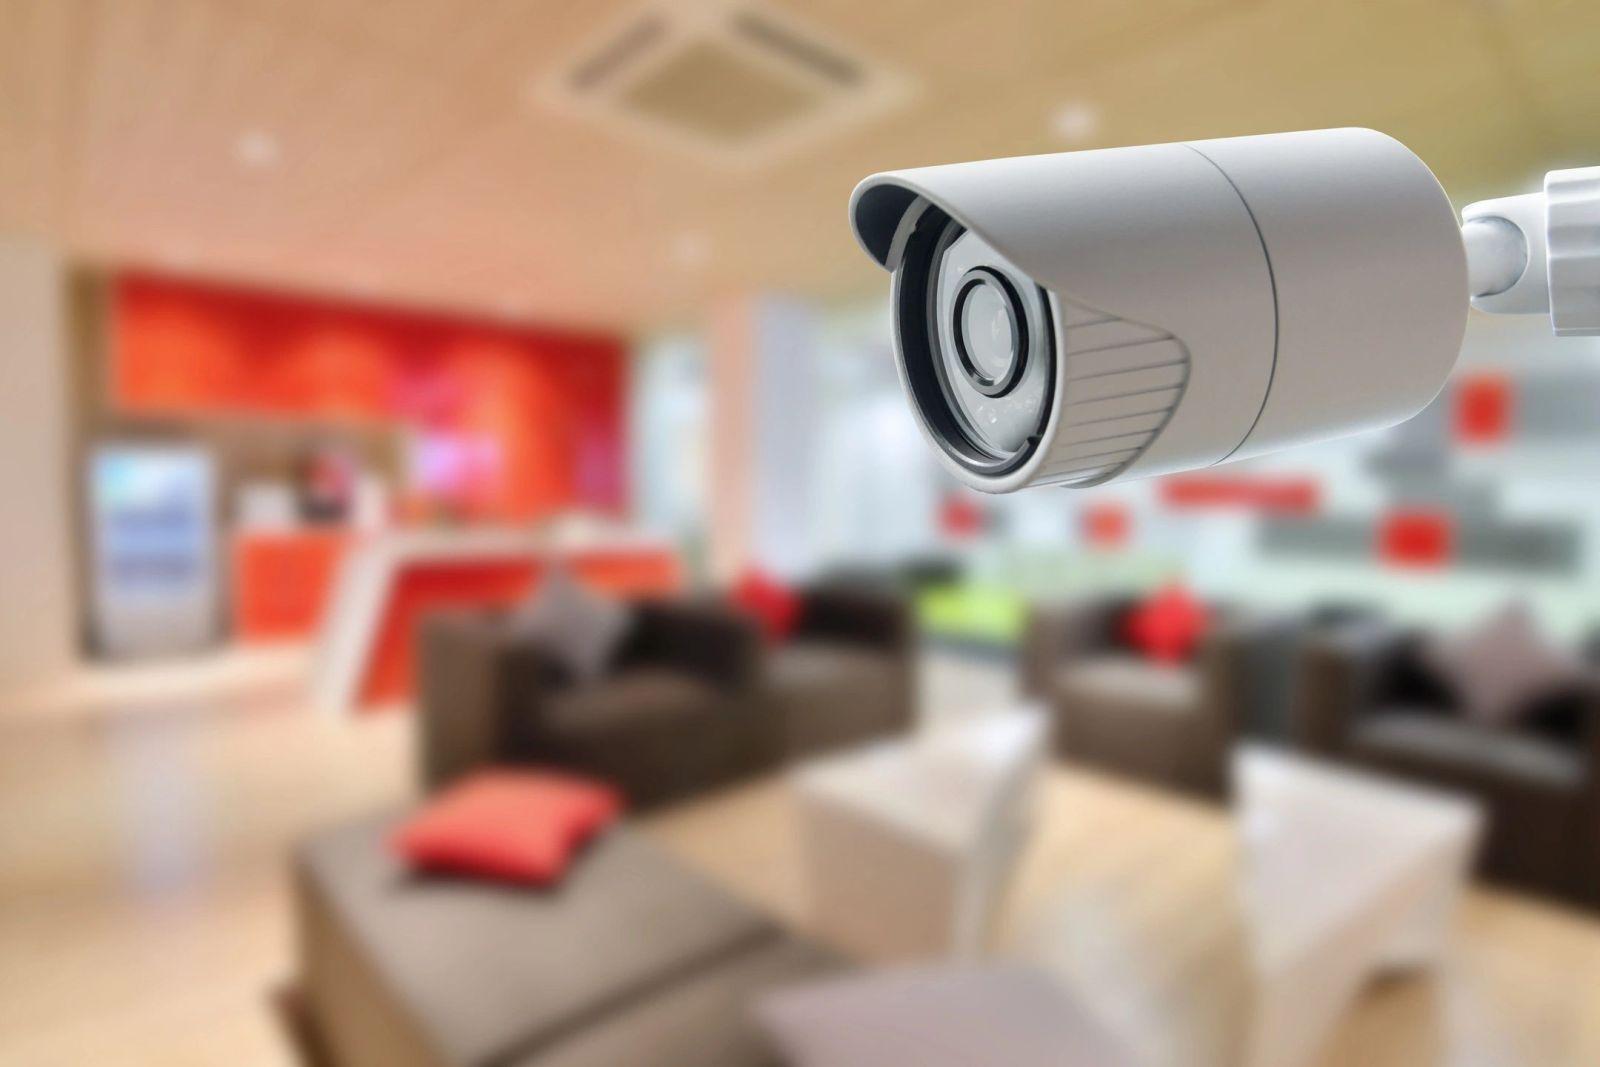 CCTV system inside the house